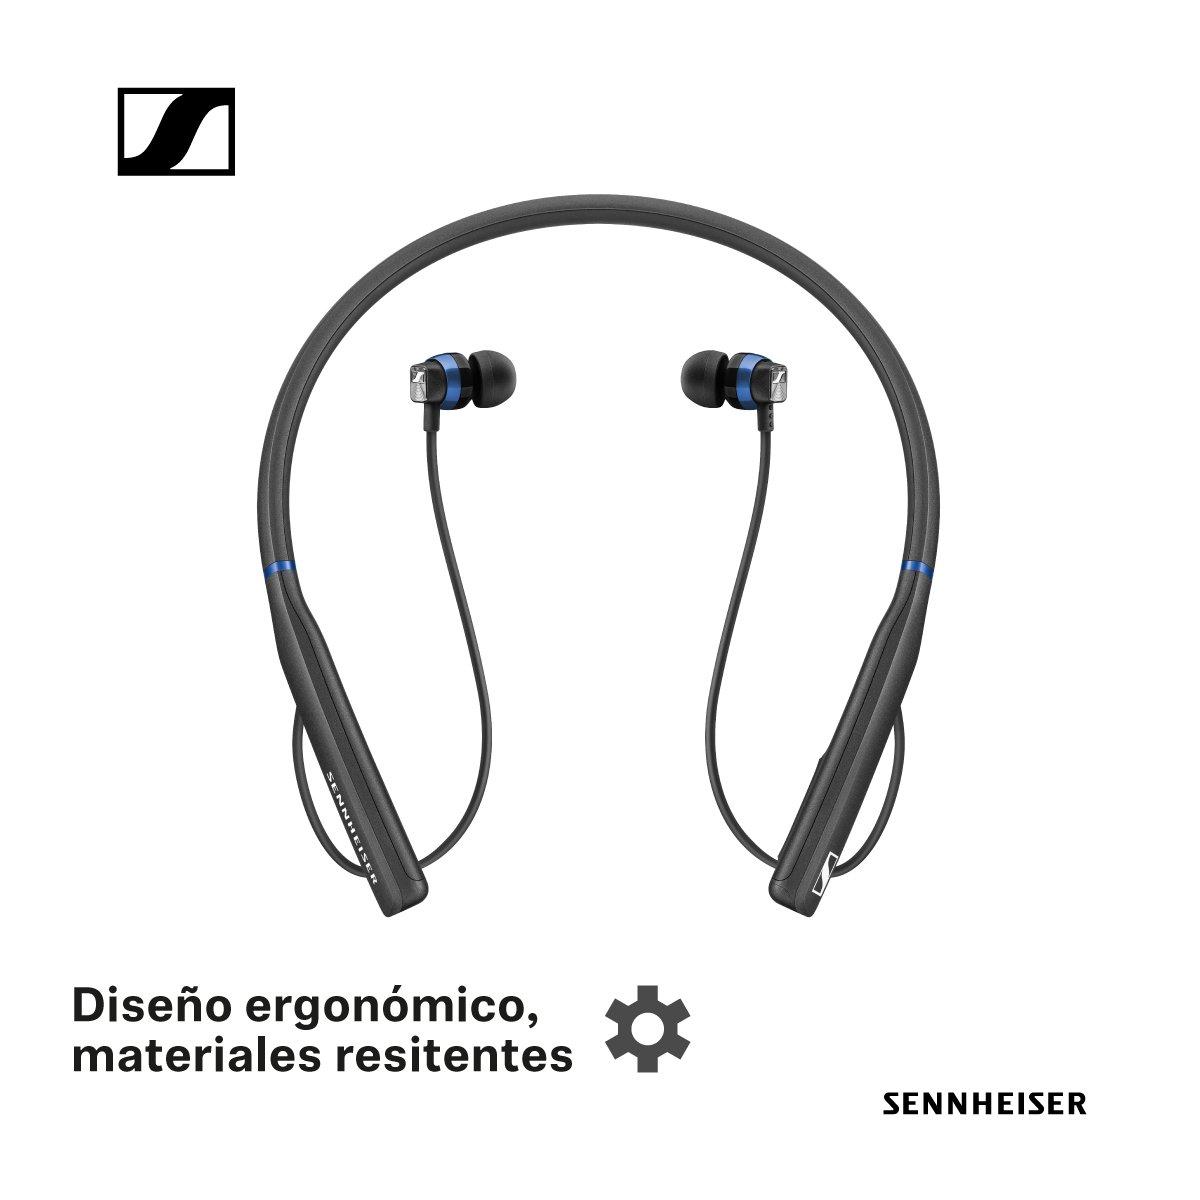 Sennheiser CX 7.00BT Wireless In-Ear Headphone w/ S&S + Free S&H at Amazon $89.95